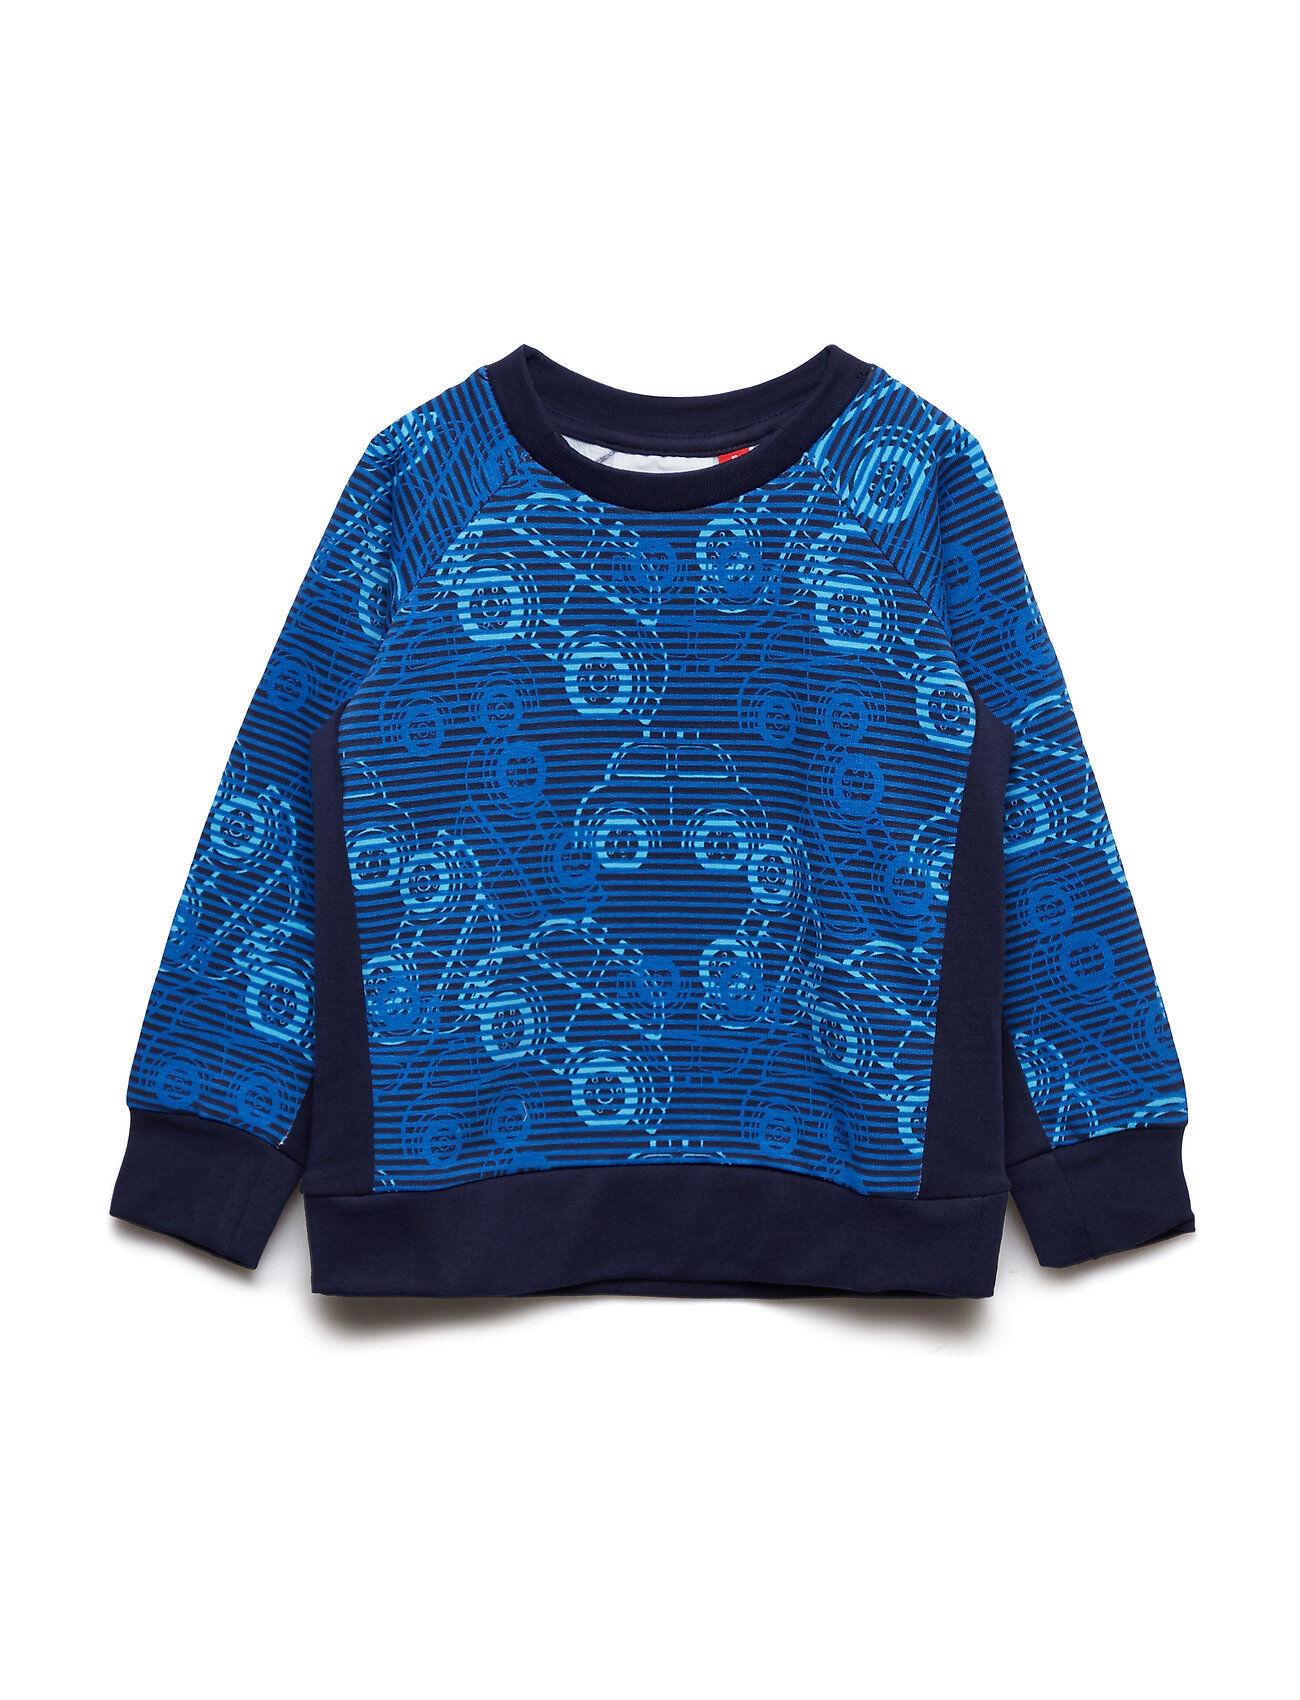 Lego Sirius 322 - Sweatshirt